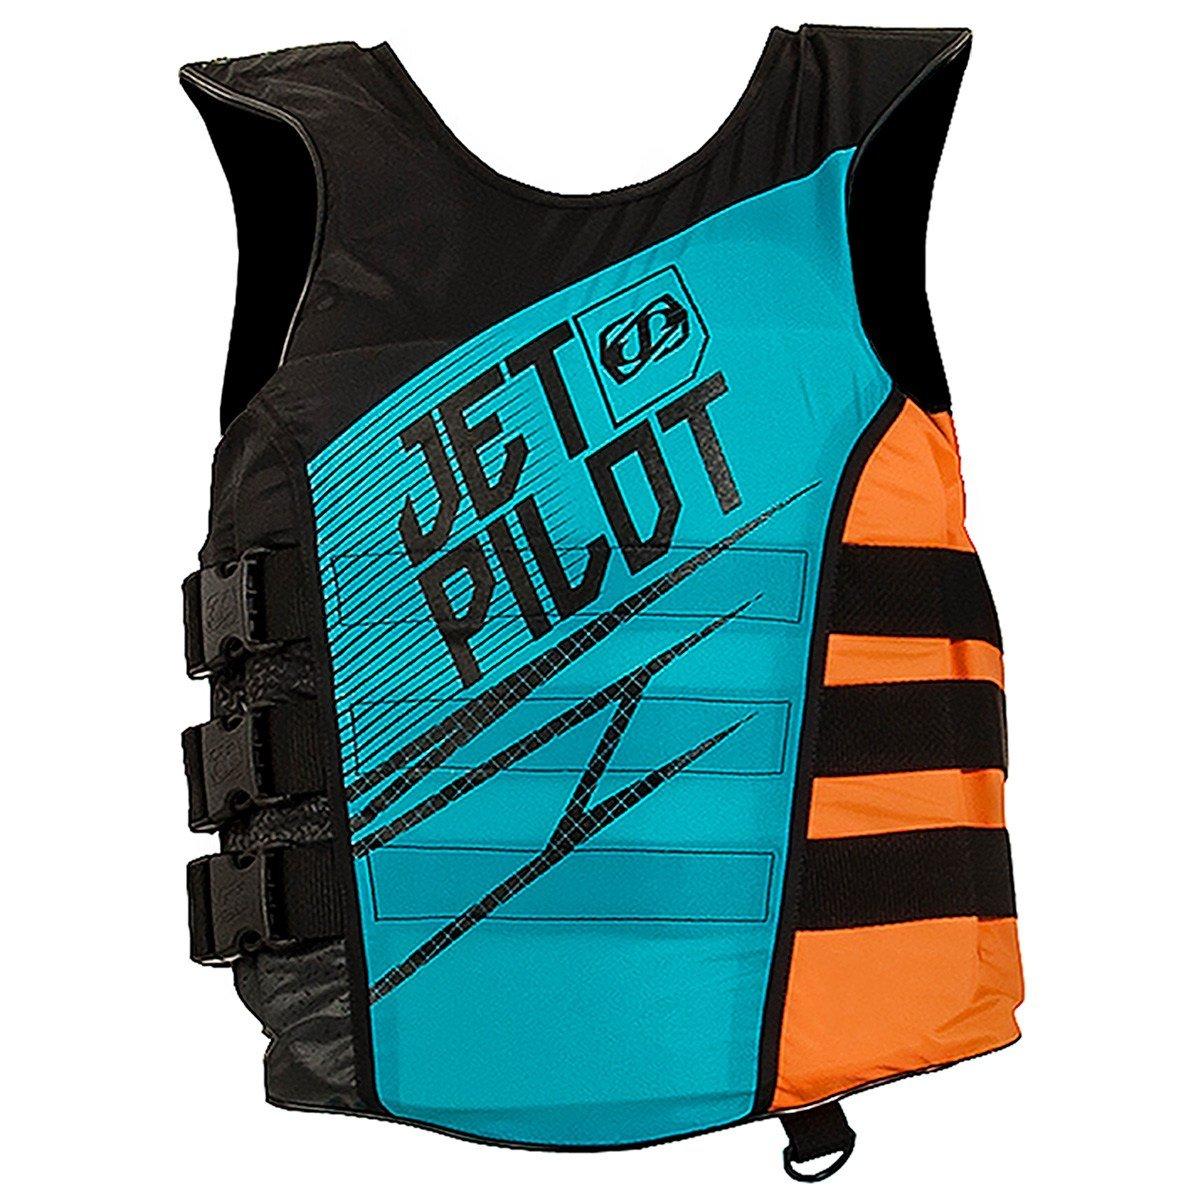 JetpilotメンズマトリックスナイロンサイドエントリPFDライフベストジャケット( L / XL ,ブルー) B01N7WOMB8